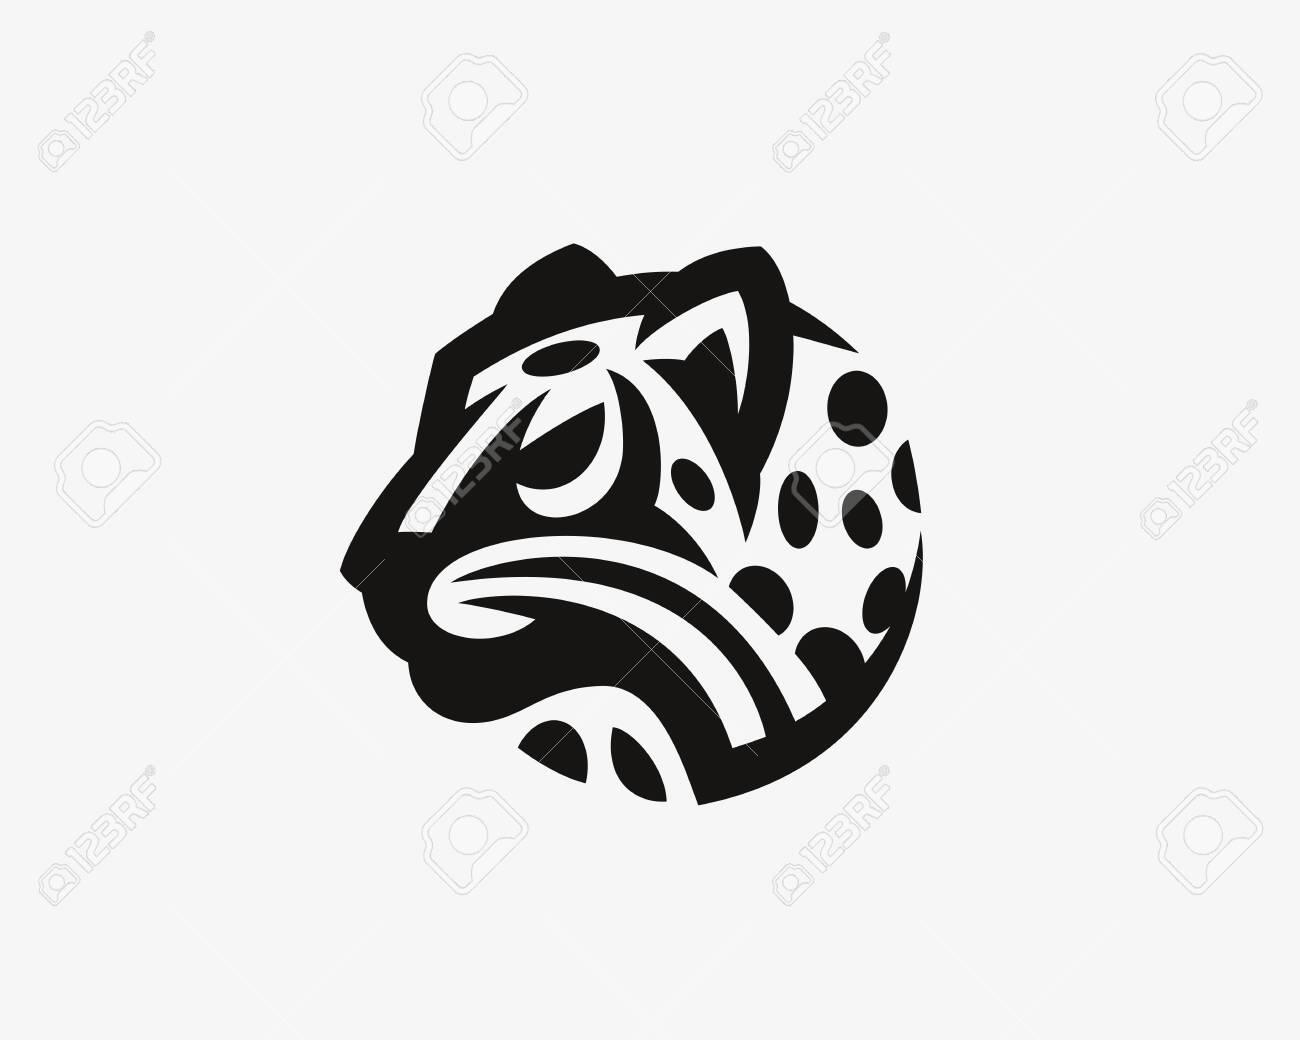 Leopard head. Wild cat emblem design editable for your business. Vector illustration. - 135295563